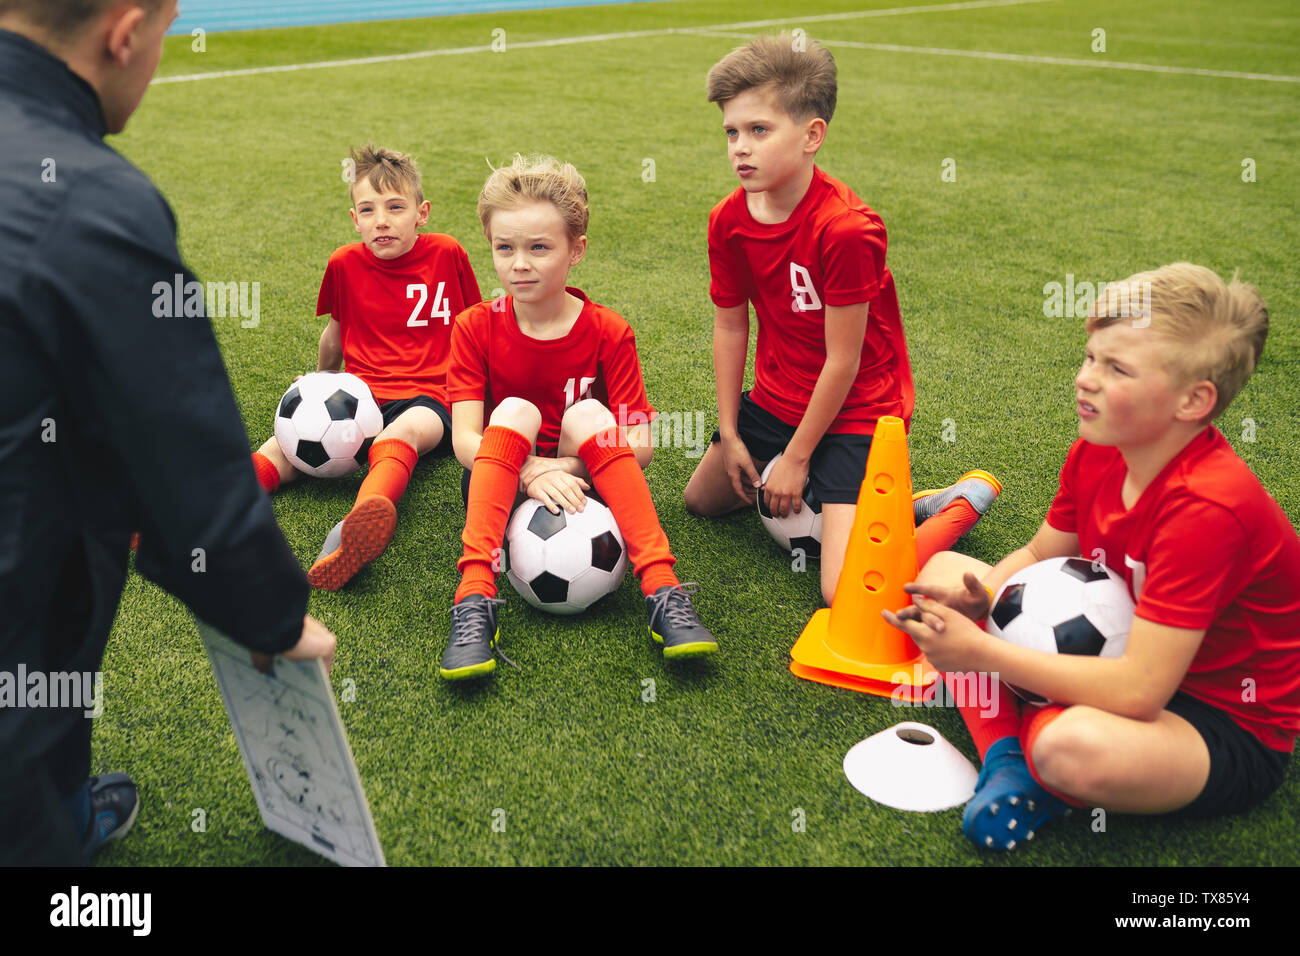 Fussball Trainer Coaching Kinder Fussball Fussball Training